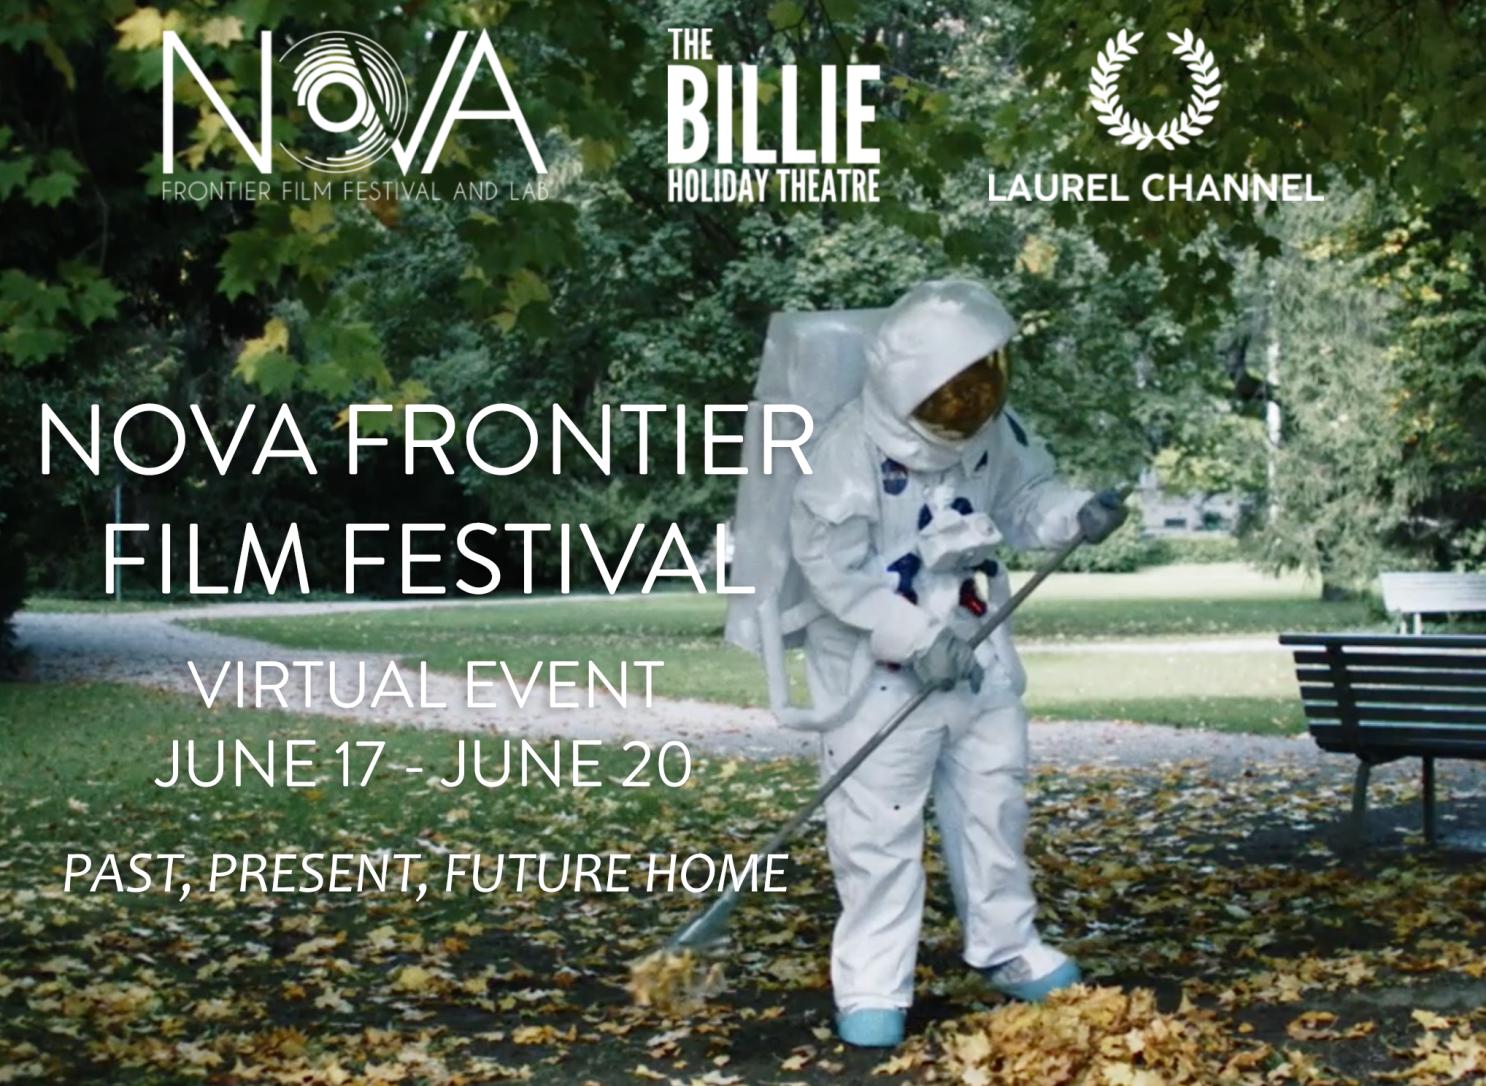 Nova Frontier Film Festival 2021